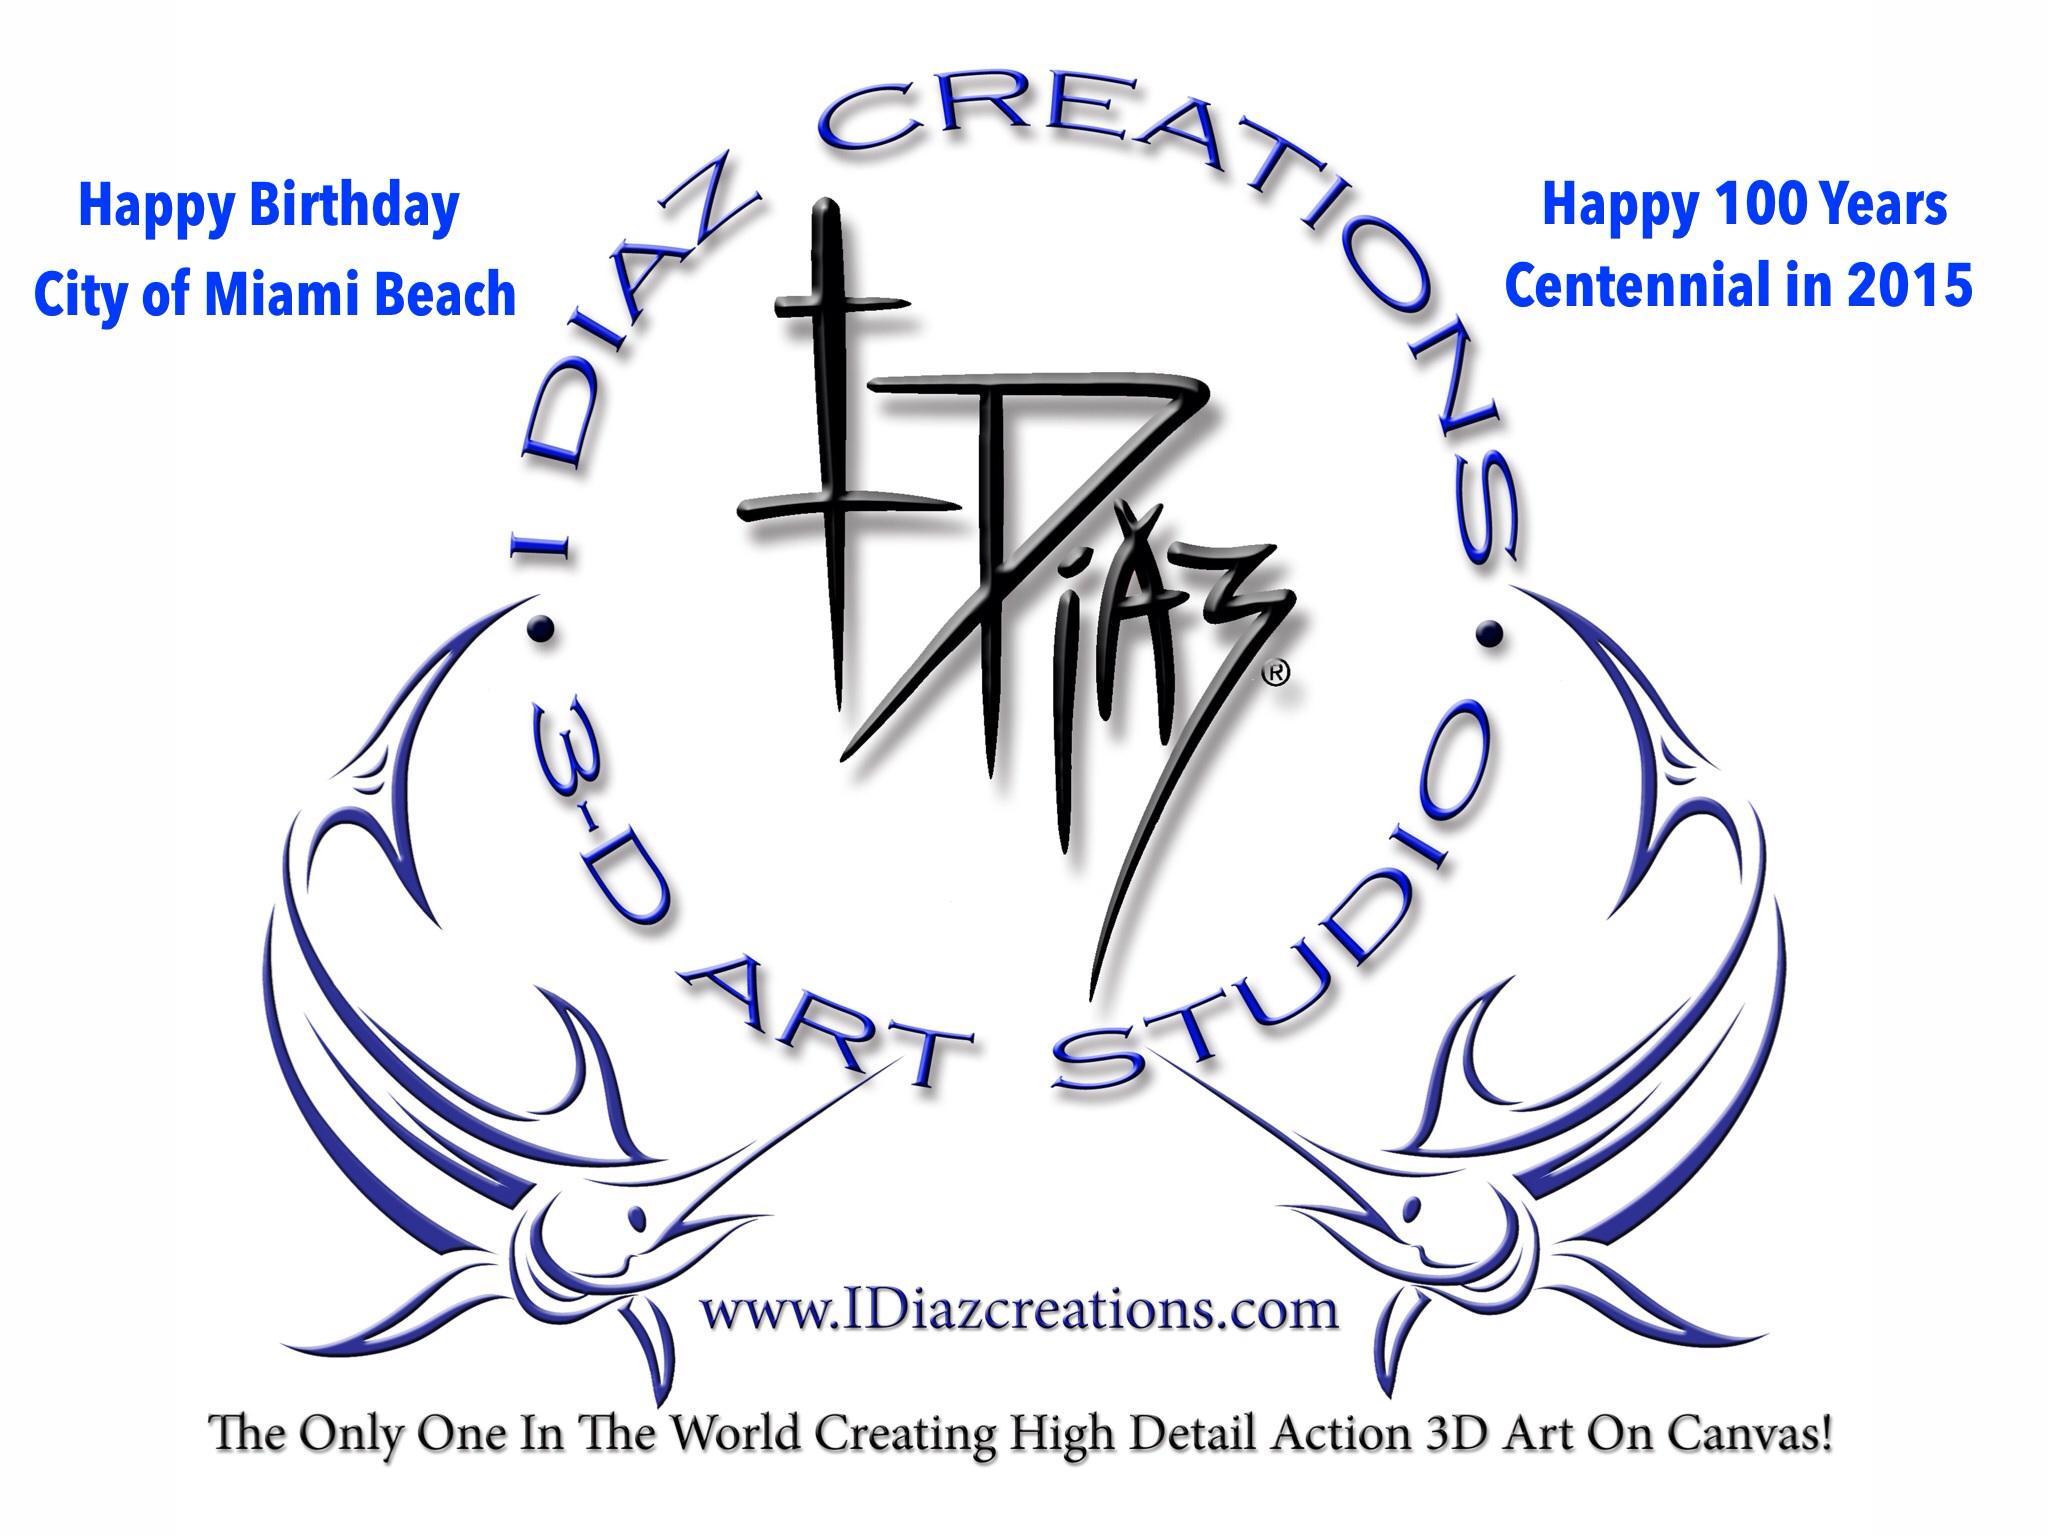 @MiamiBeach100 @idiazcreations Happy Birthday Miami Beach 100 Centennial 2015 http://t.co/0MVO8YhCu5